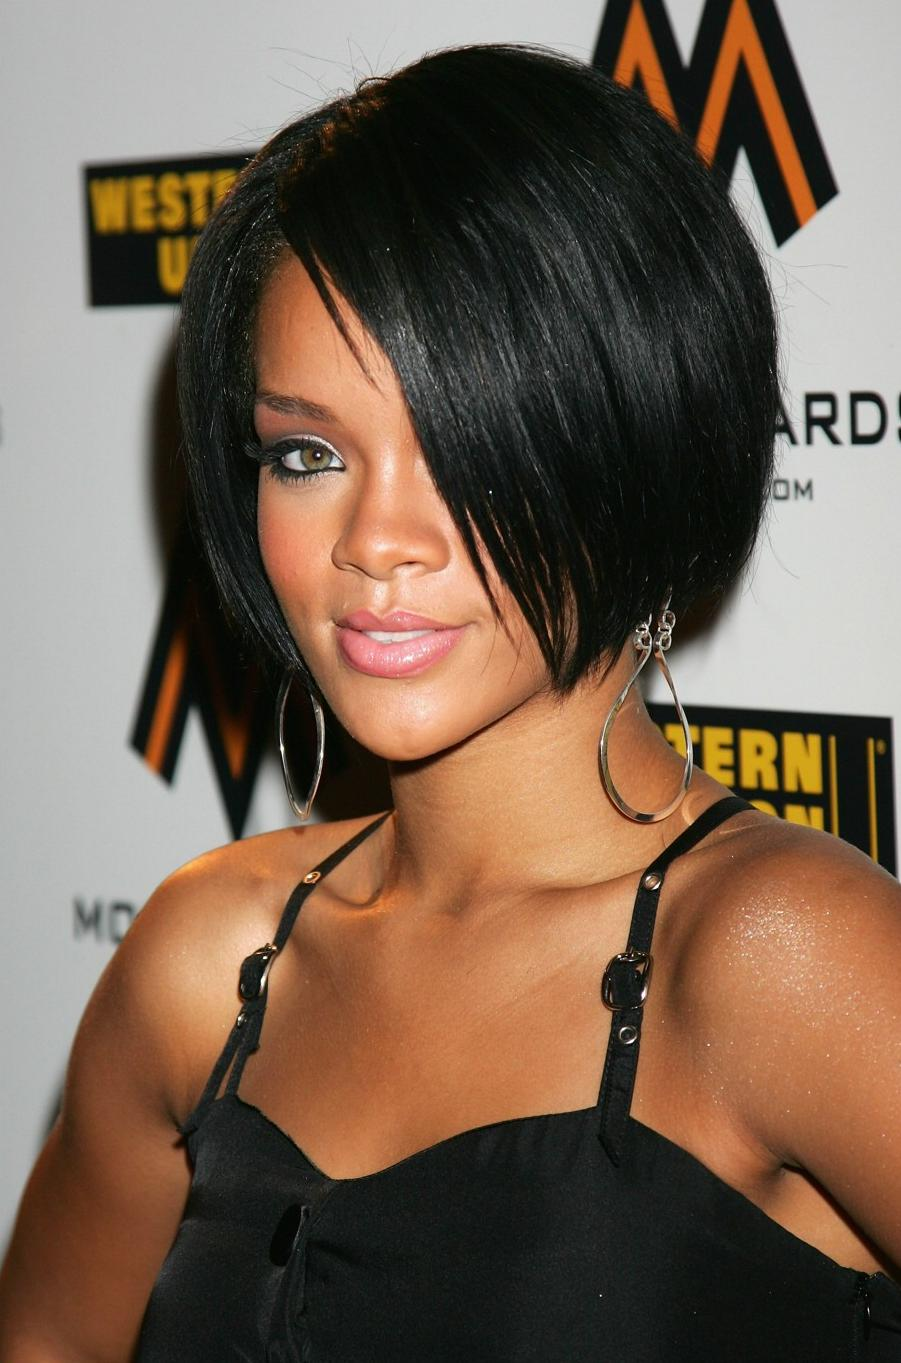 a new life hartz: Rihanna s man down Hairstyles